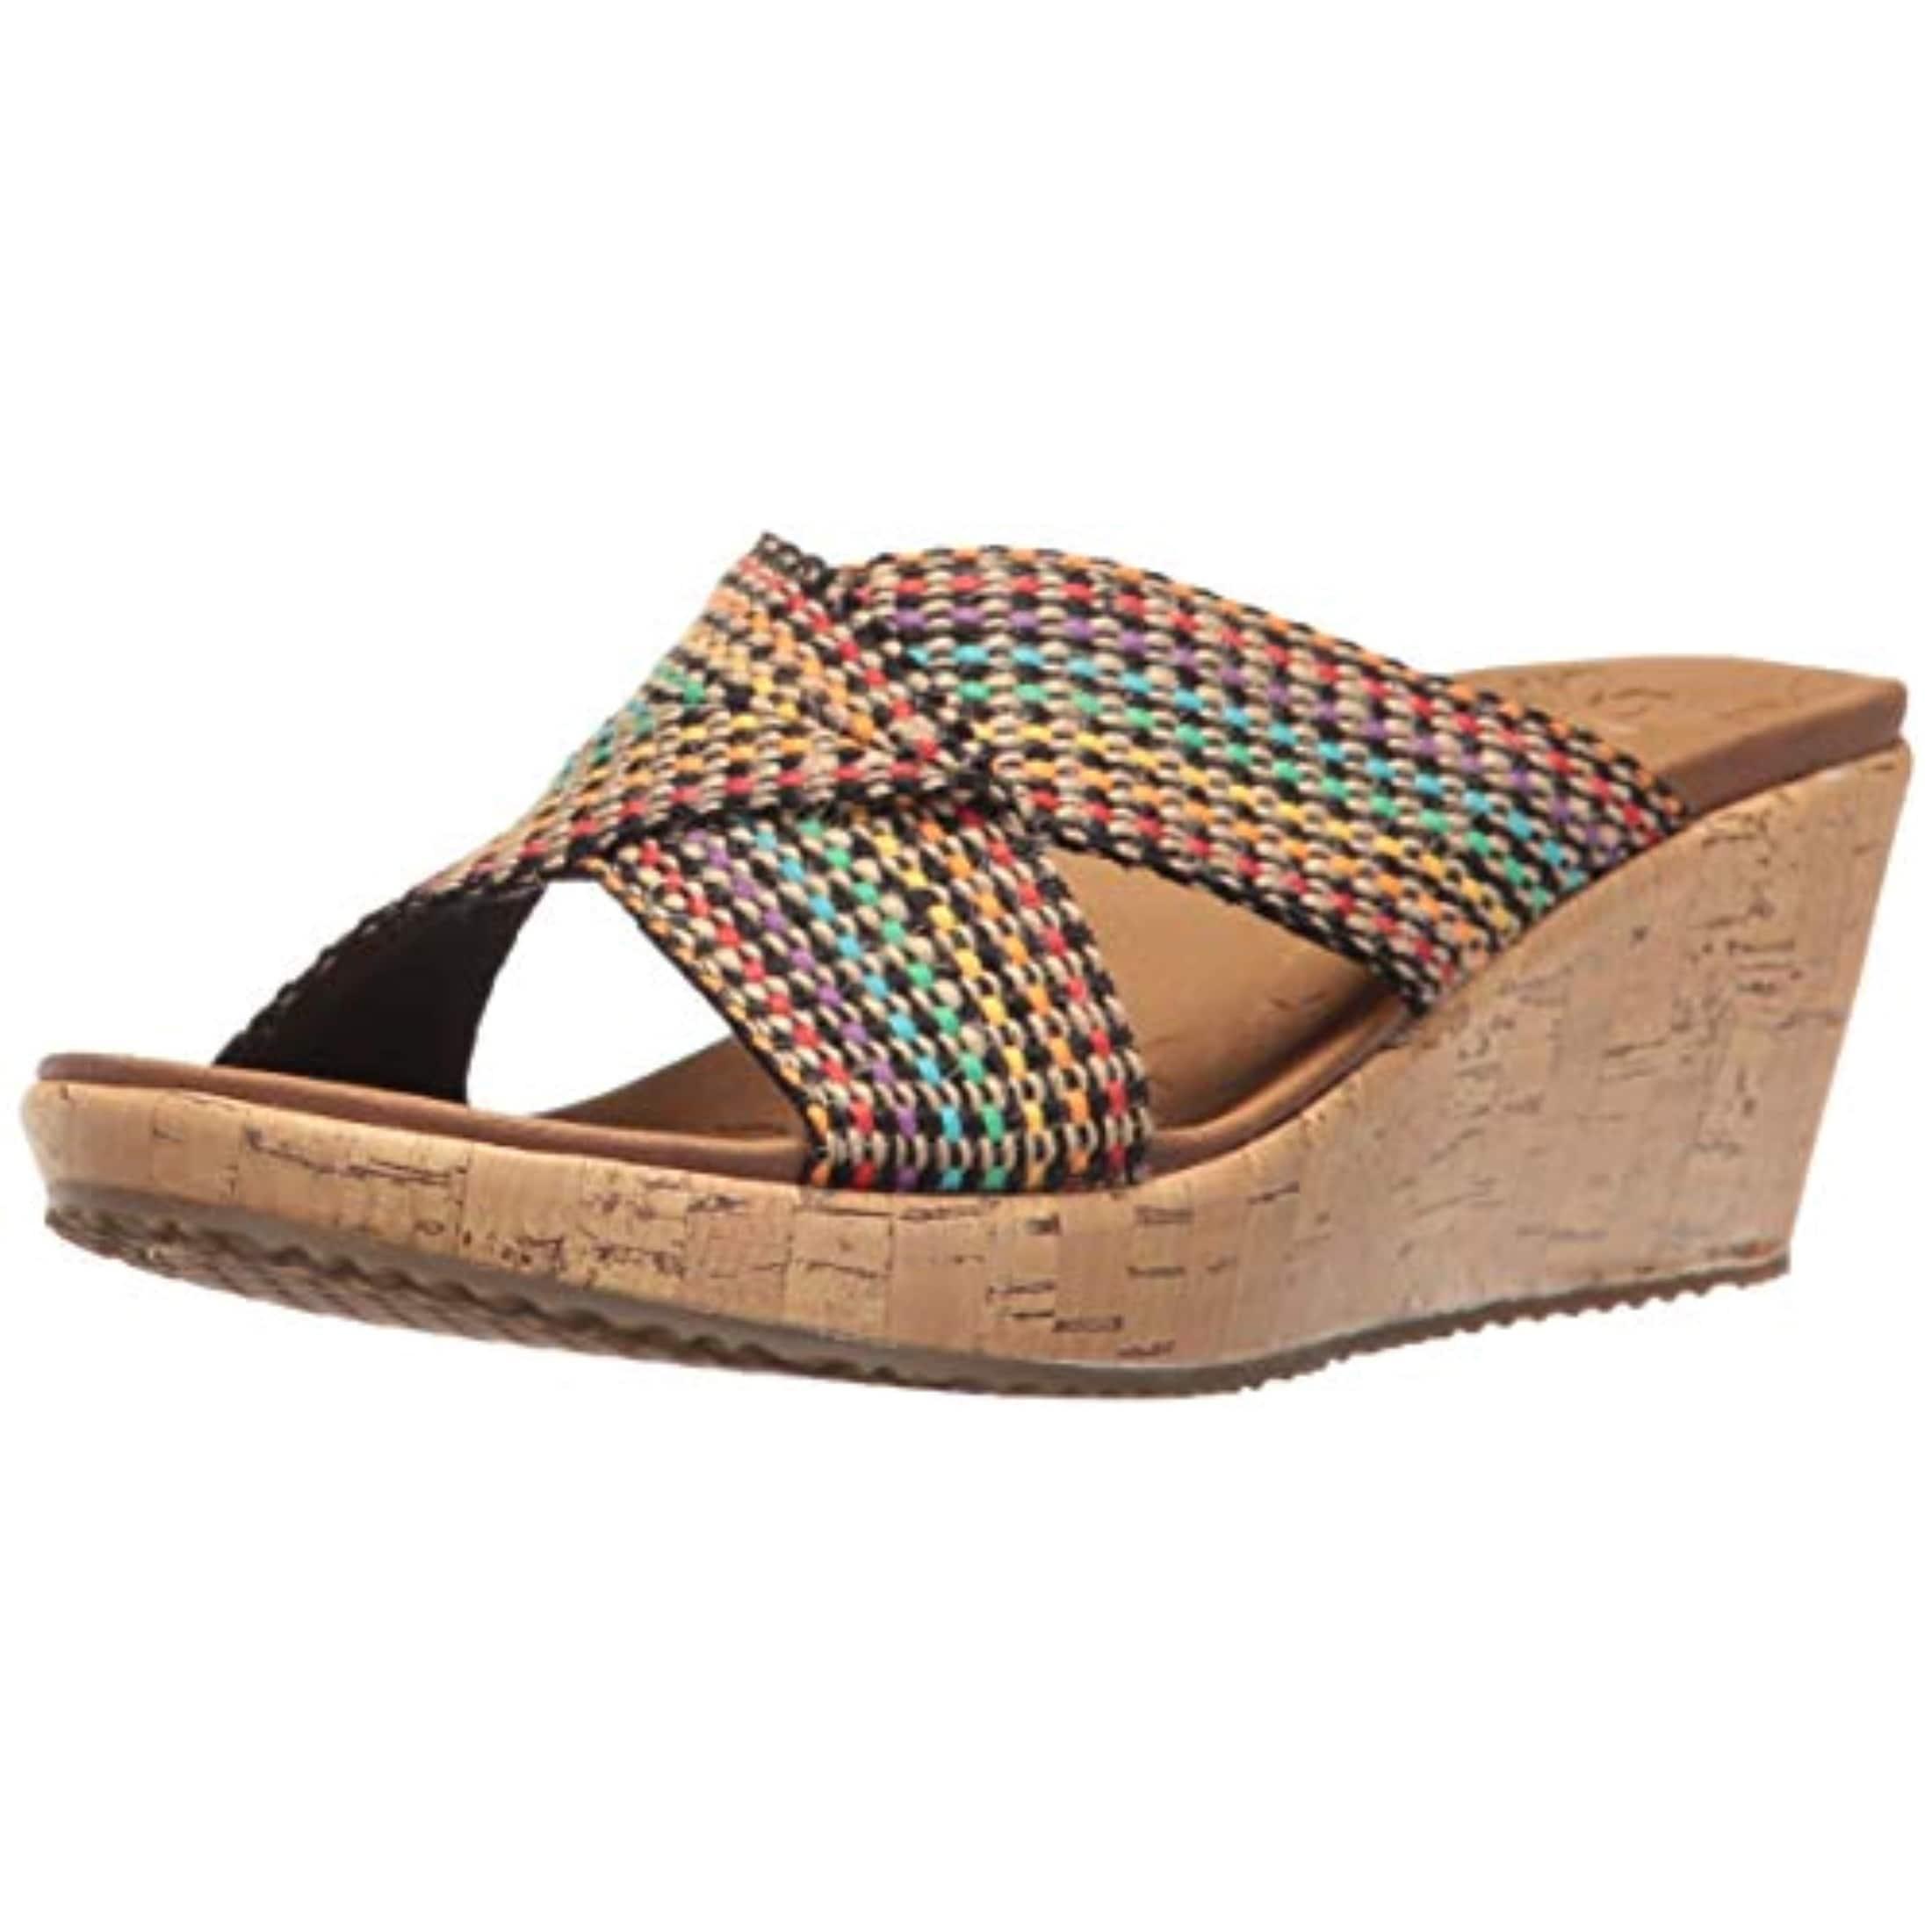 Beverlee Delighted Wedge Sandal, Multi